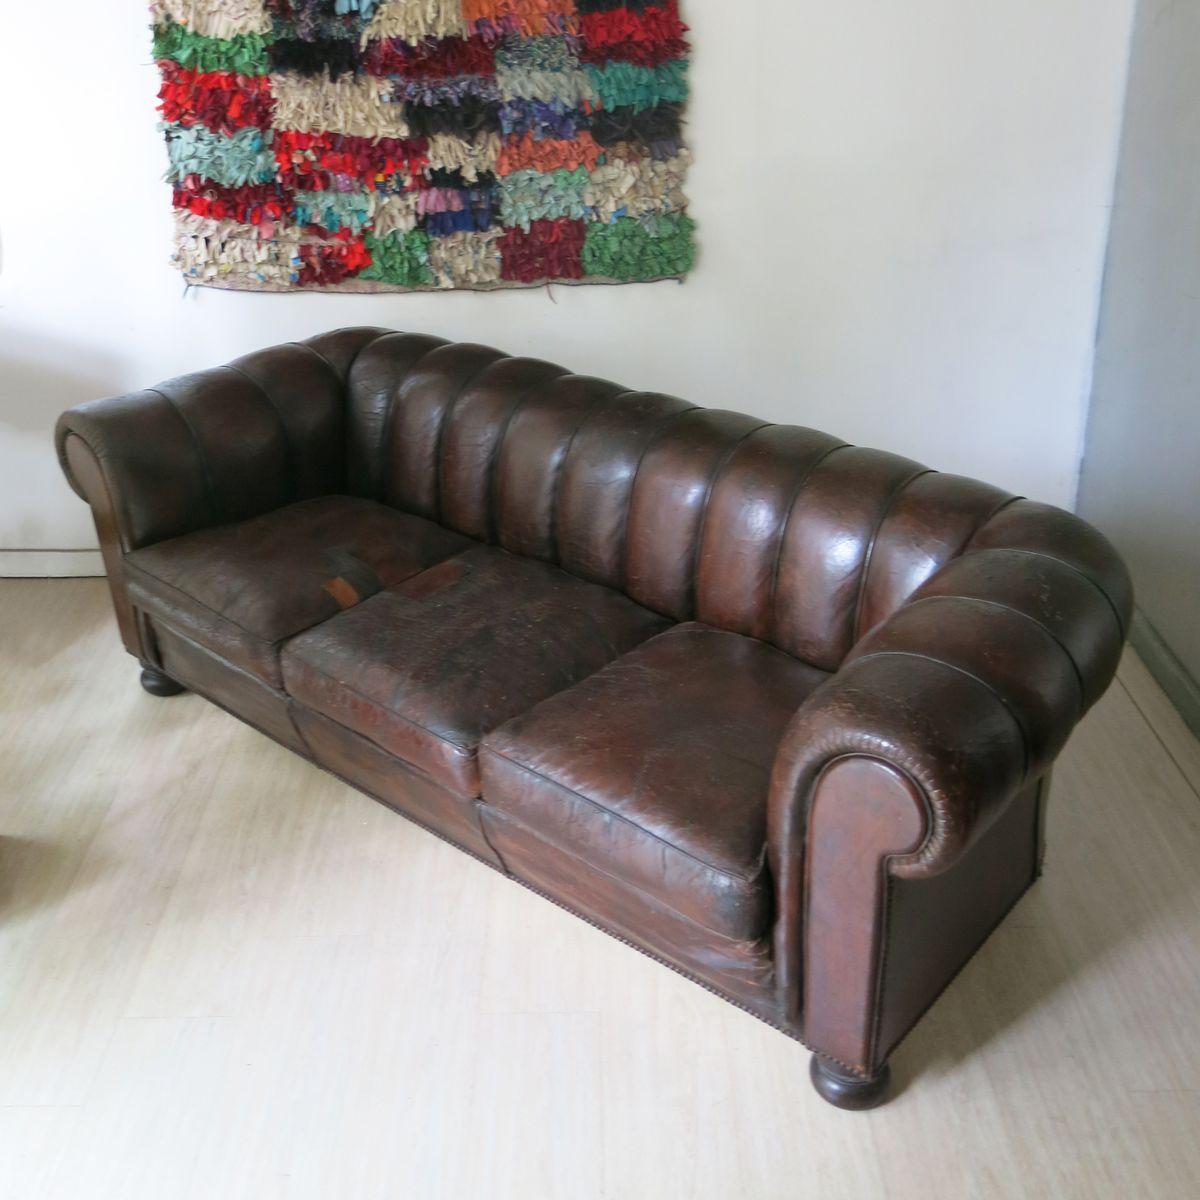 franz sisches chesterfield ledersofa 1930er bei pamono kaufen. Black Bedroom Furniture Sets. Home Design Ideas